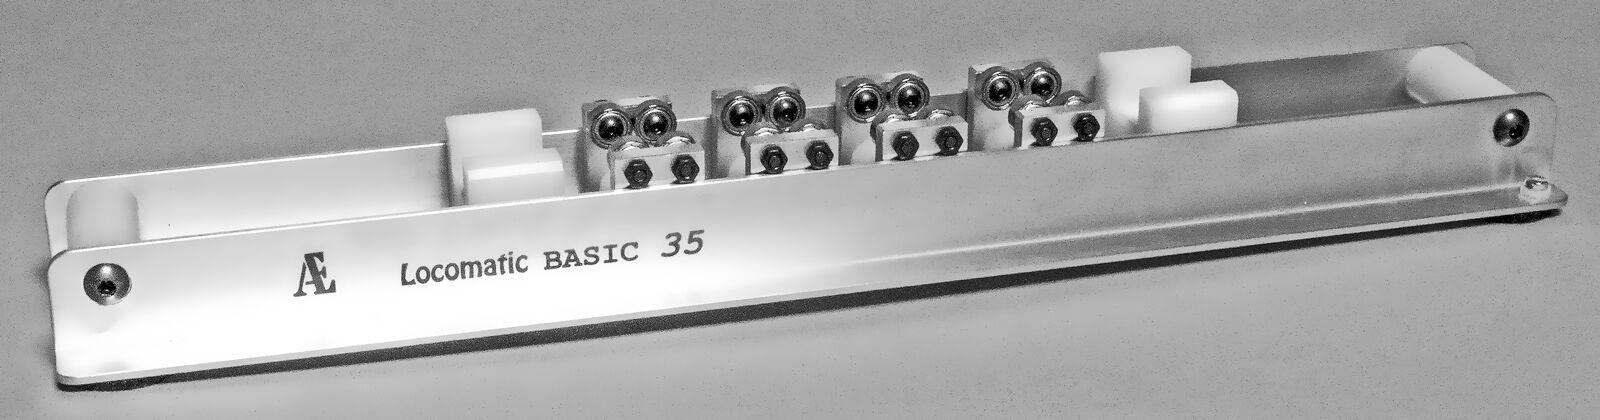 Banco prova Locomatic HO - serie BASIC 35 CC  Cod. LoHO.B35.01cc